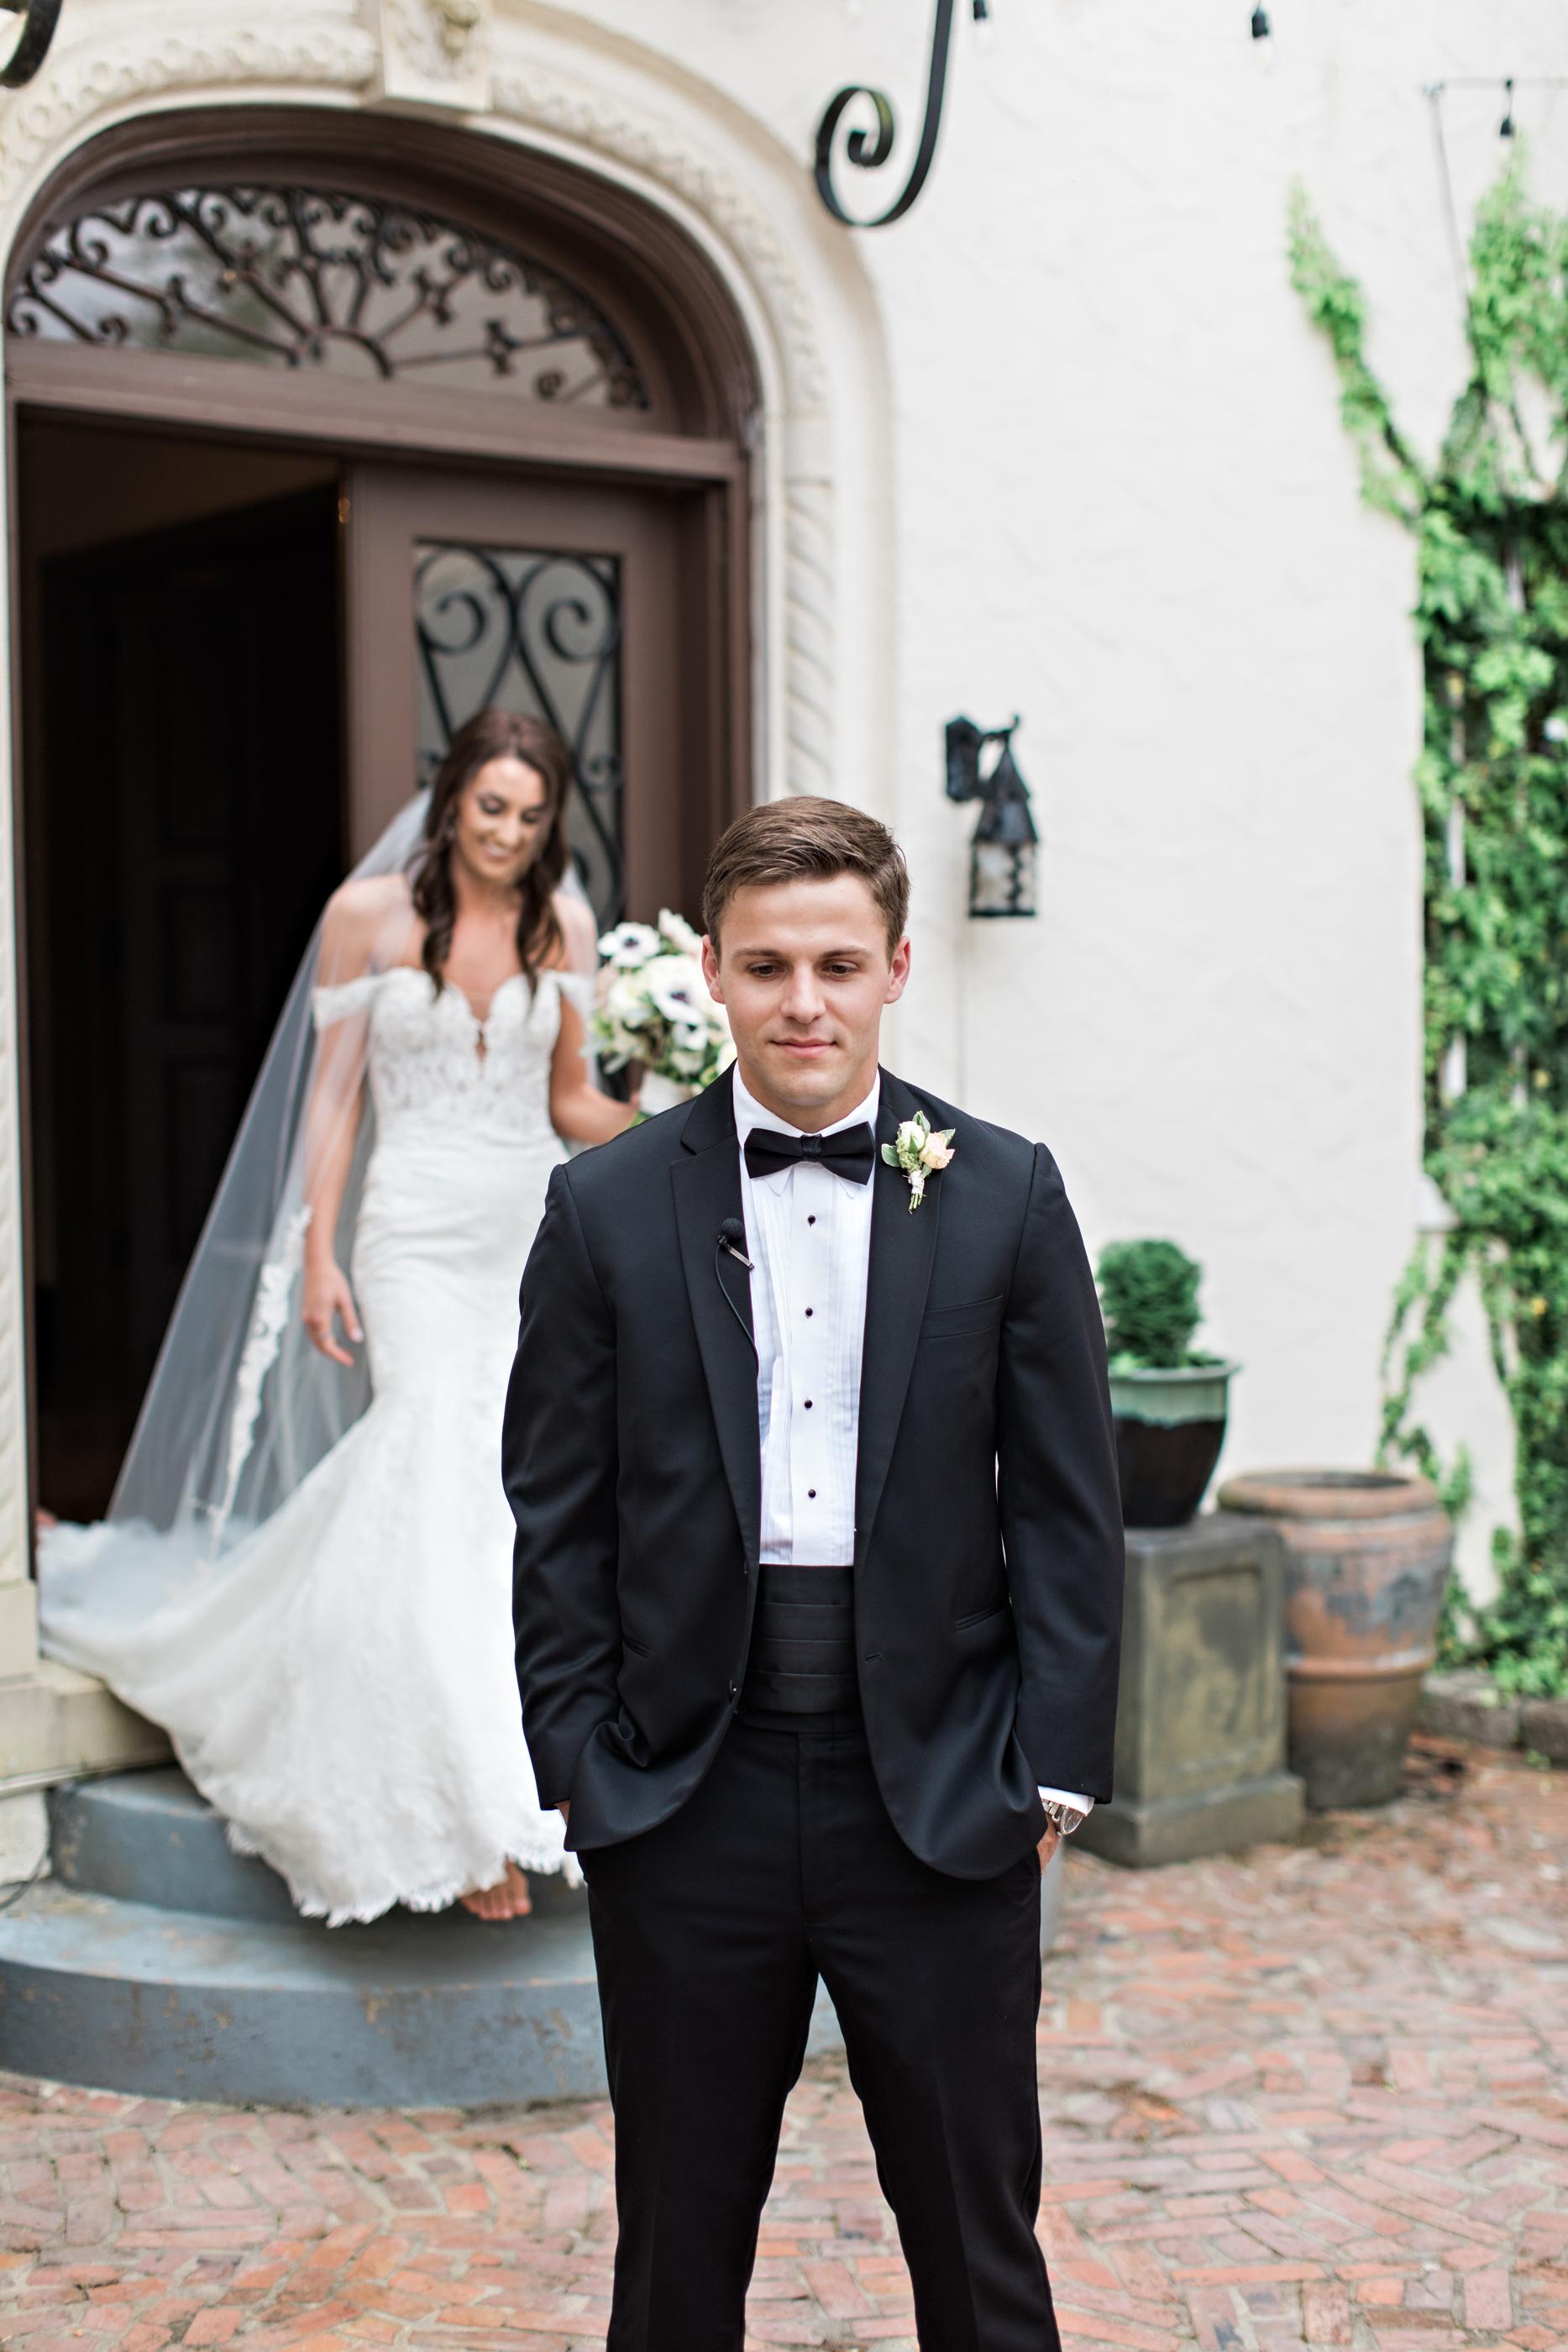 Matty-Drollette-Montgomery-Alabama-Wedding-Photography-117.jpg